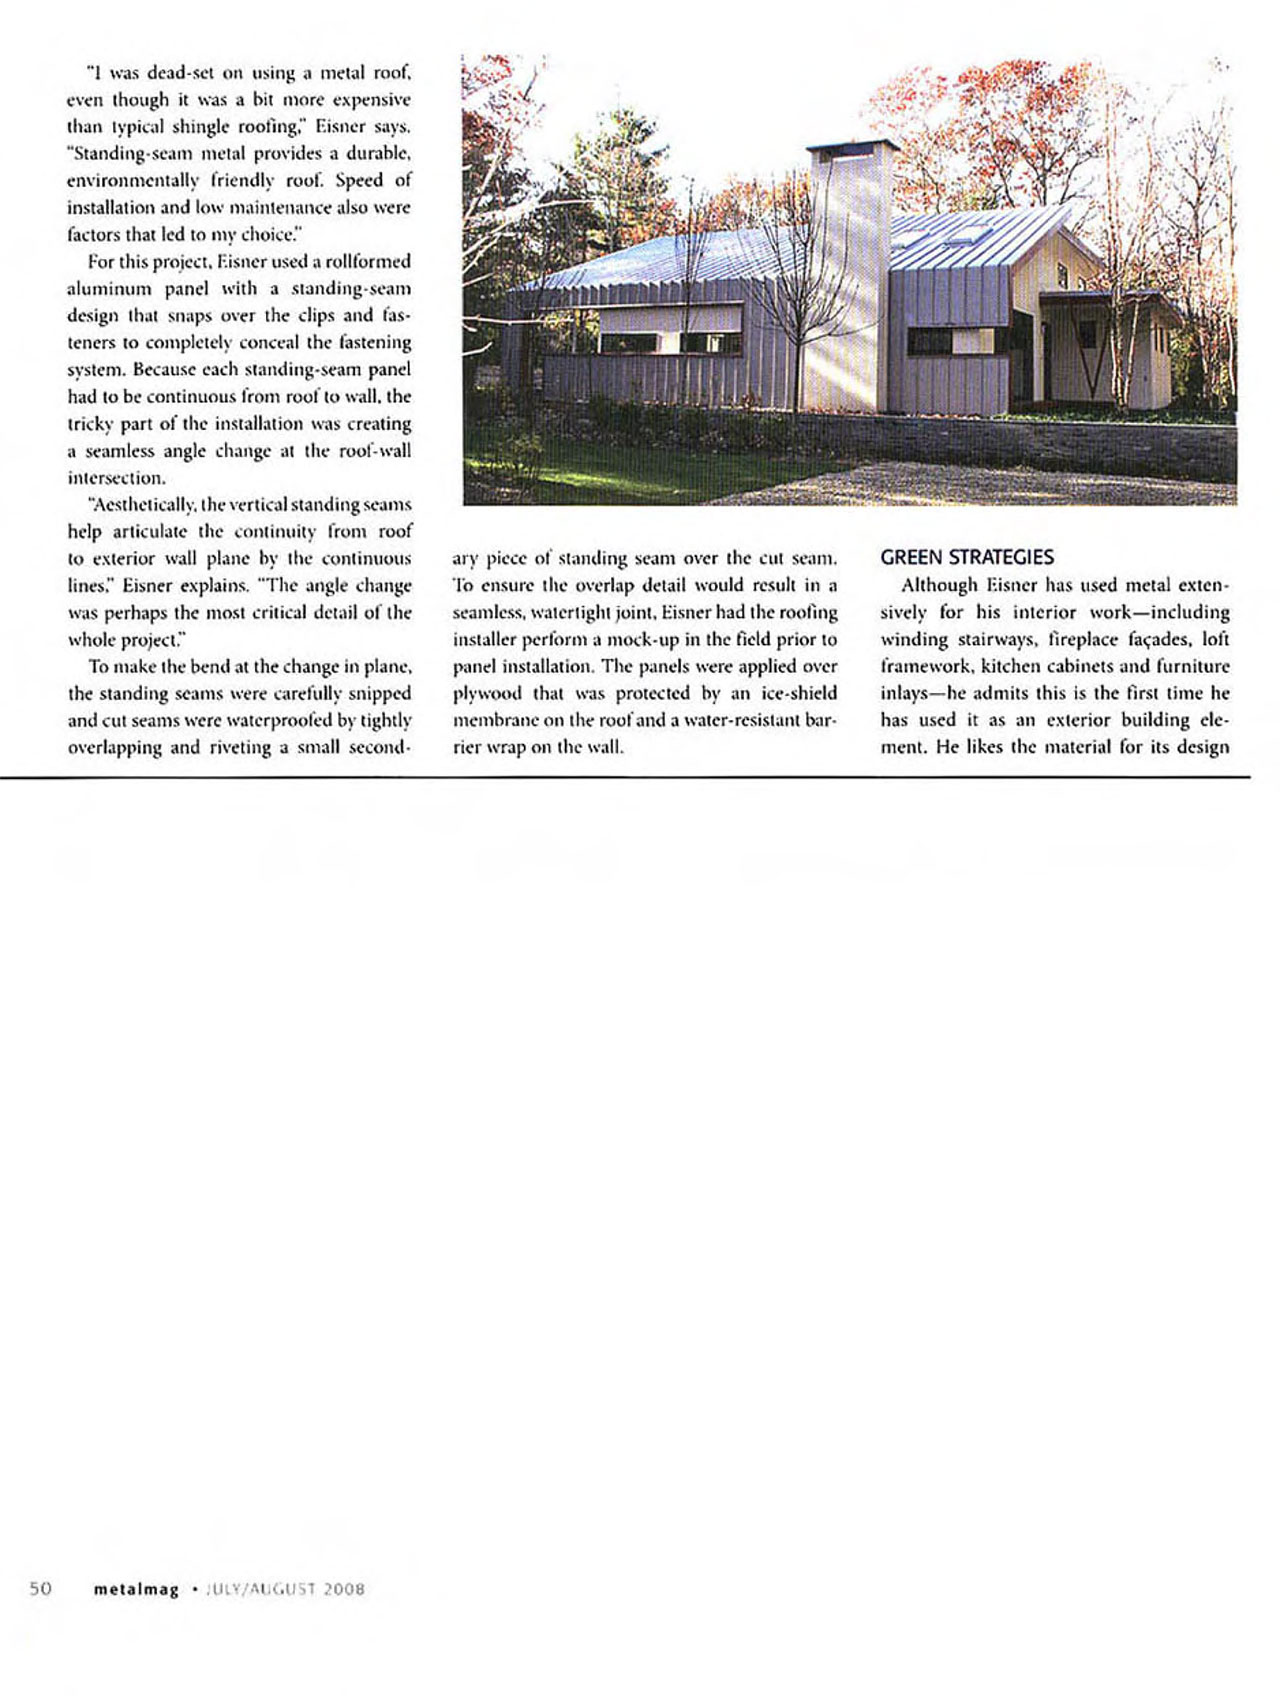 02_News_Metal-Magazine-Whalerock-Lane-05_web_w1280